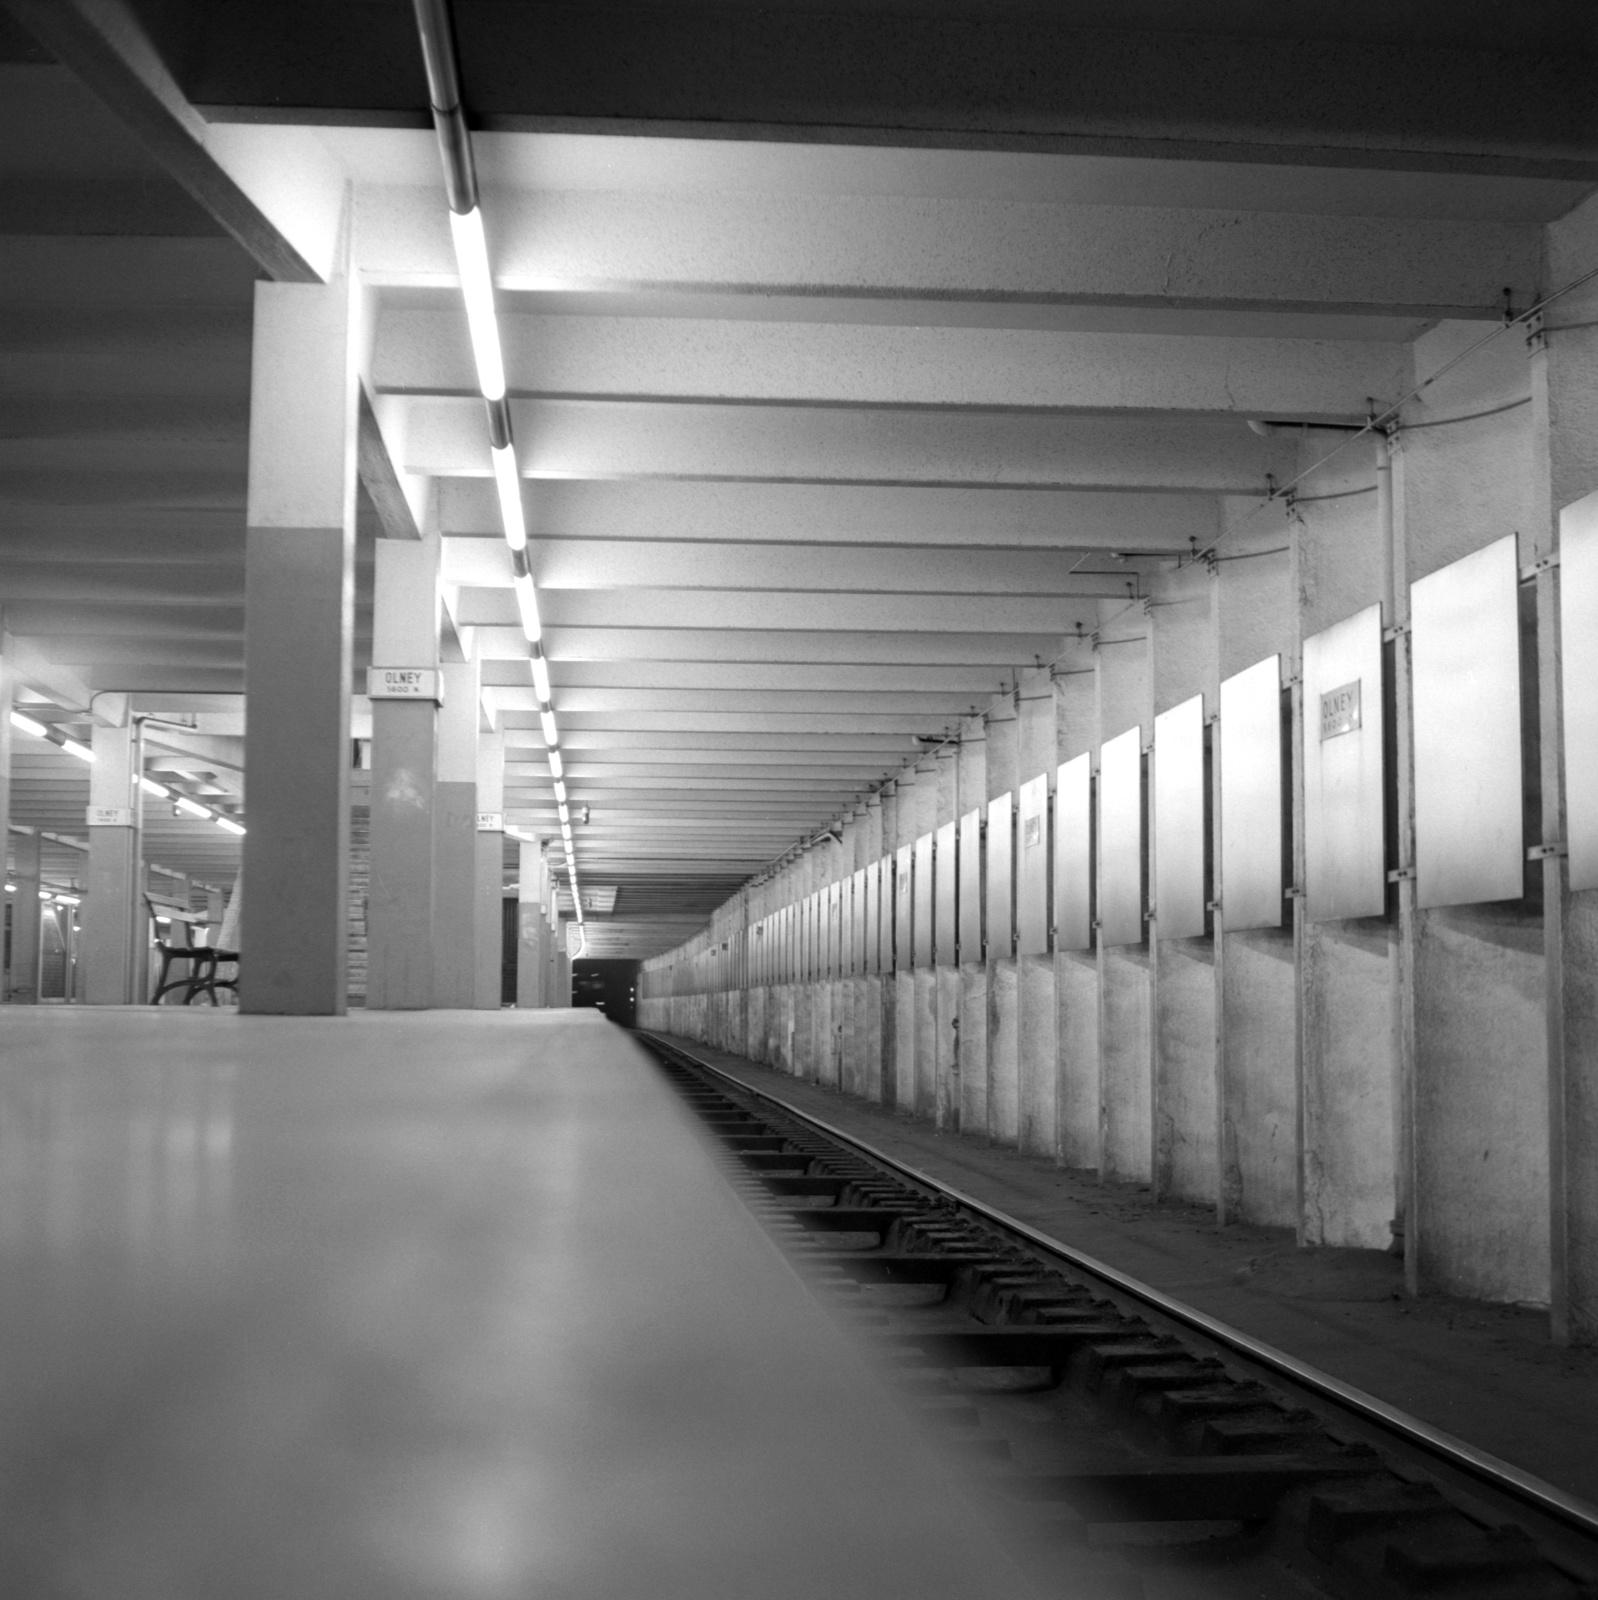 (565k, 1598x1600)<br><b>Country:</b> United States<br><b>City:</b> Philadelphia, PA<br><b>System:</b> SEPTA (or Predecessor)<br><b>Line:</b> Broad Street Subway<br><b>Location:</b> Olney<br><b>Collection of:</b> David Pirmann<br><b>Date:</b> 10/26/1968<br><b>Viewed (this week/total):</b> 2 / 64